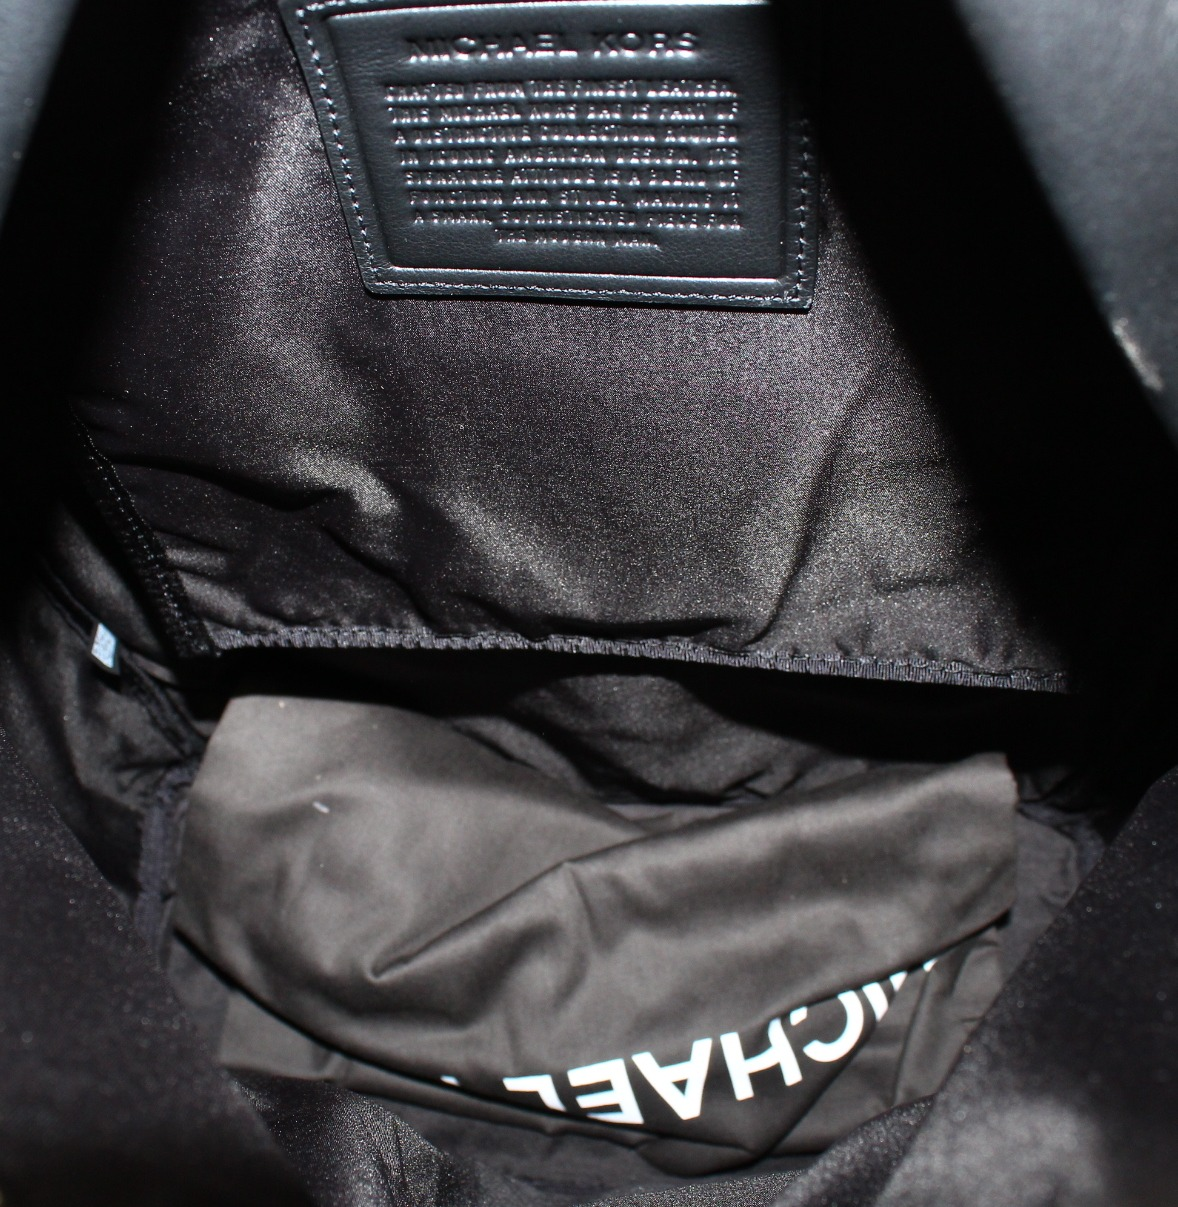 77482660875d MICHAEL KORS NEW Black Pebble Leather Odin Resina Men's Backpack Bag -  Walmart.com